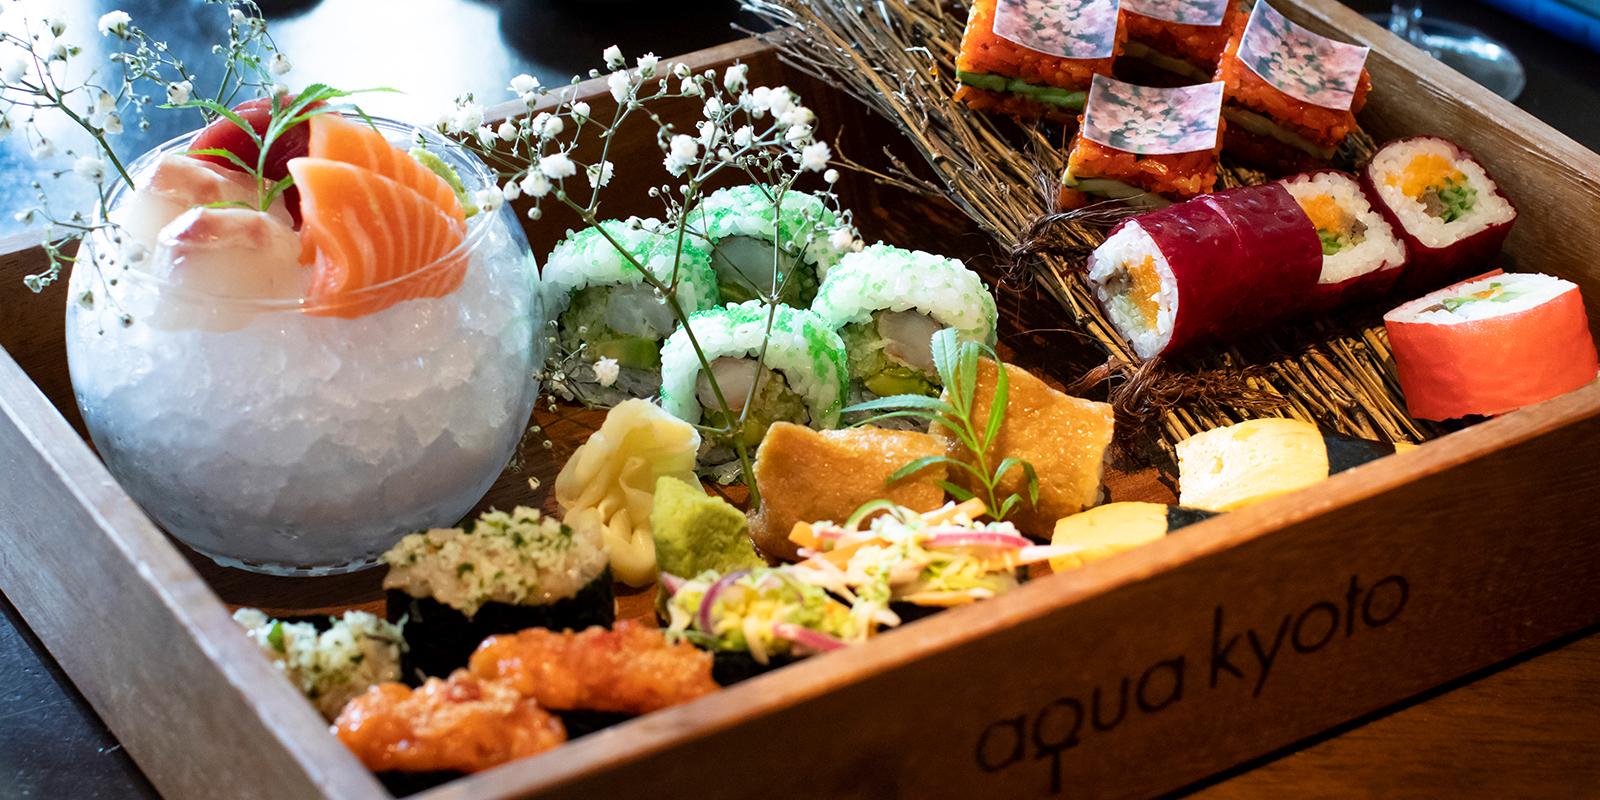 Sunday Brunch at Aqua Kyoto